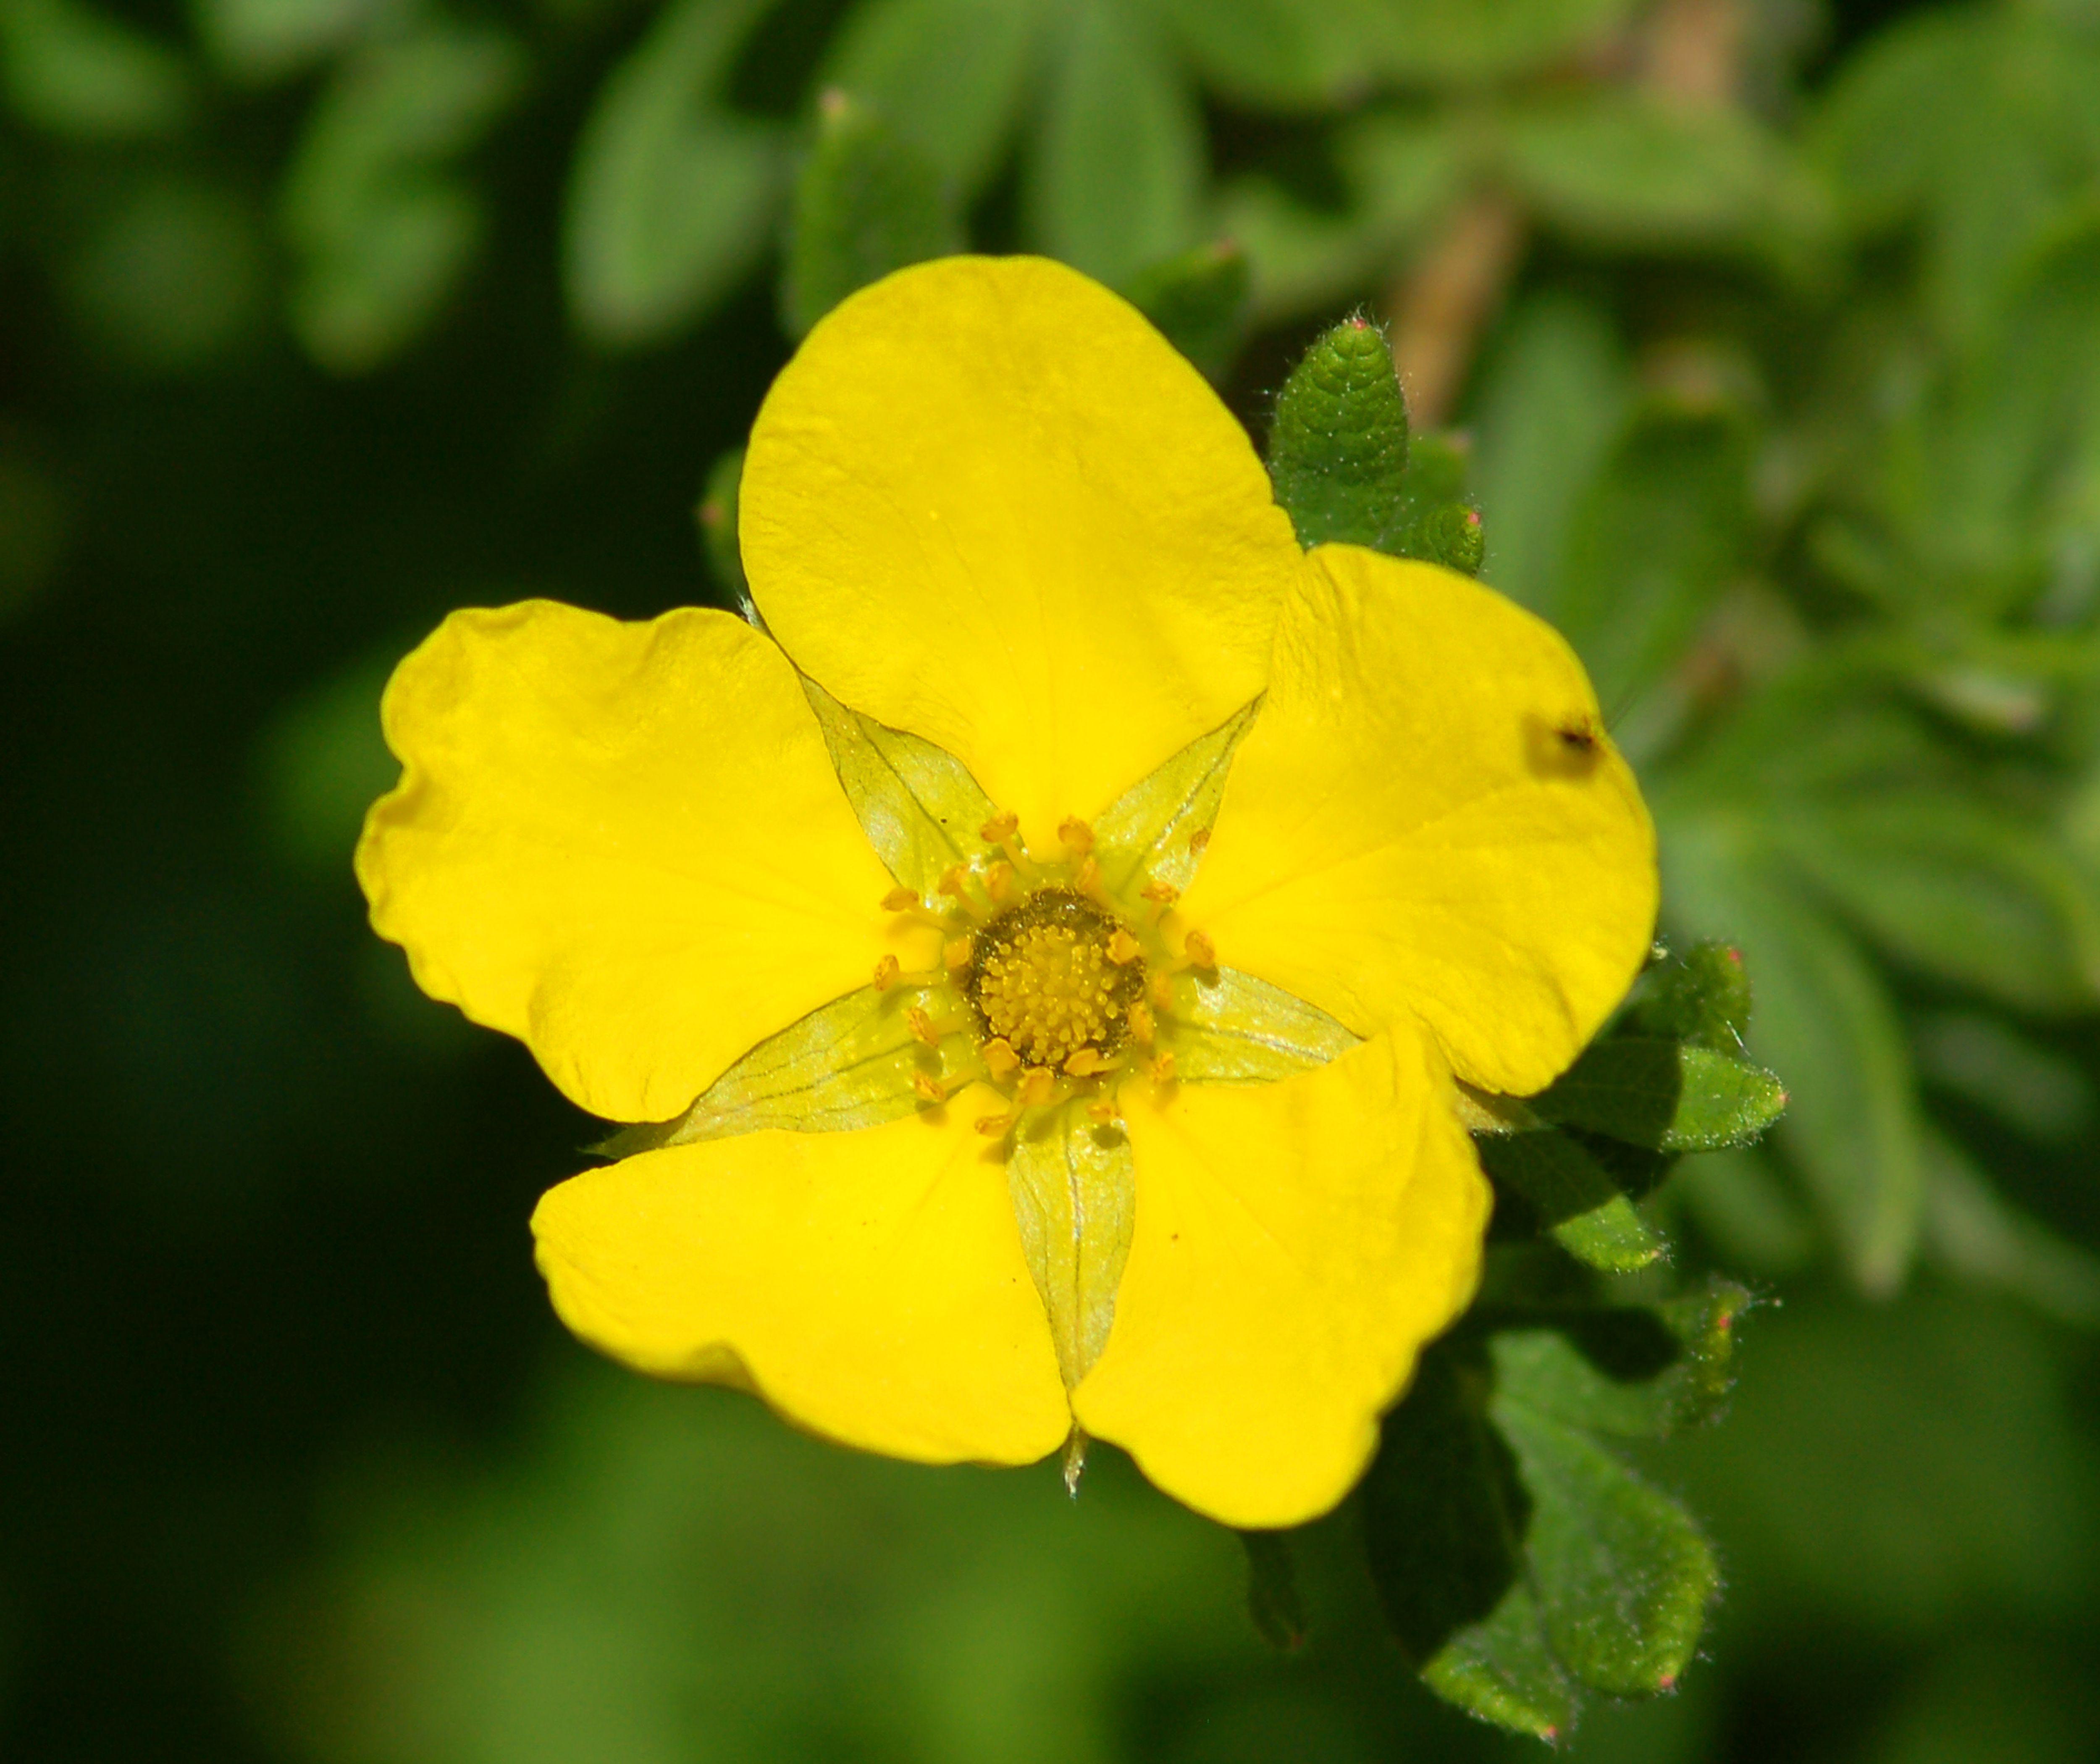 Yellow Potentilla in bloom.